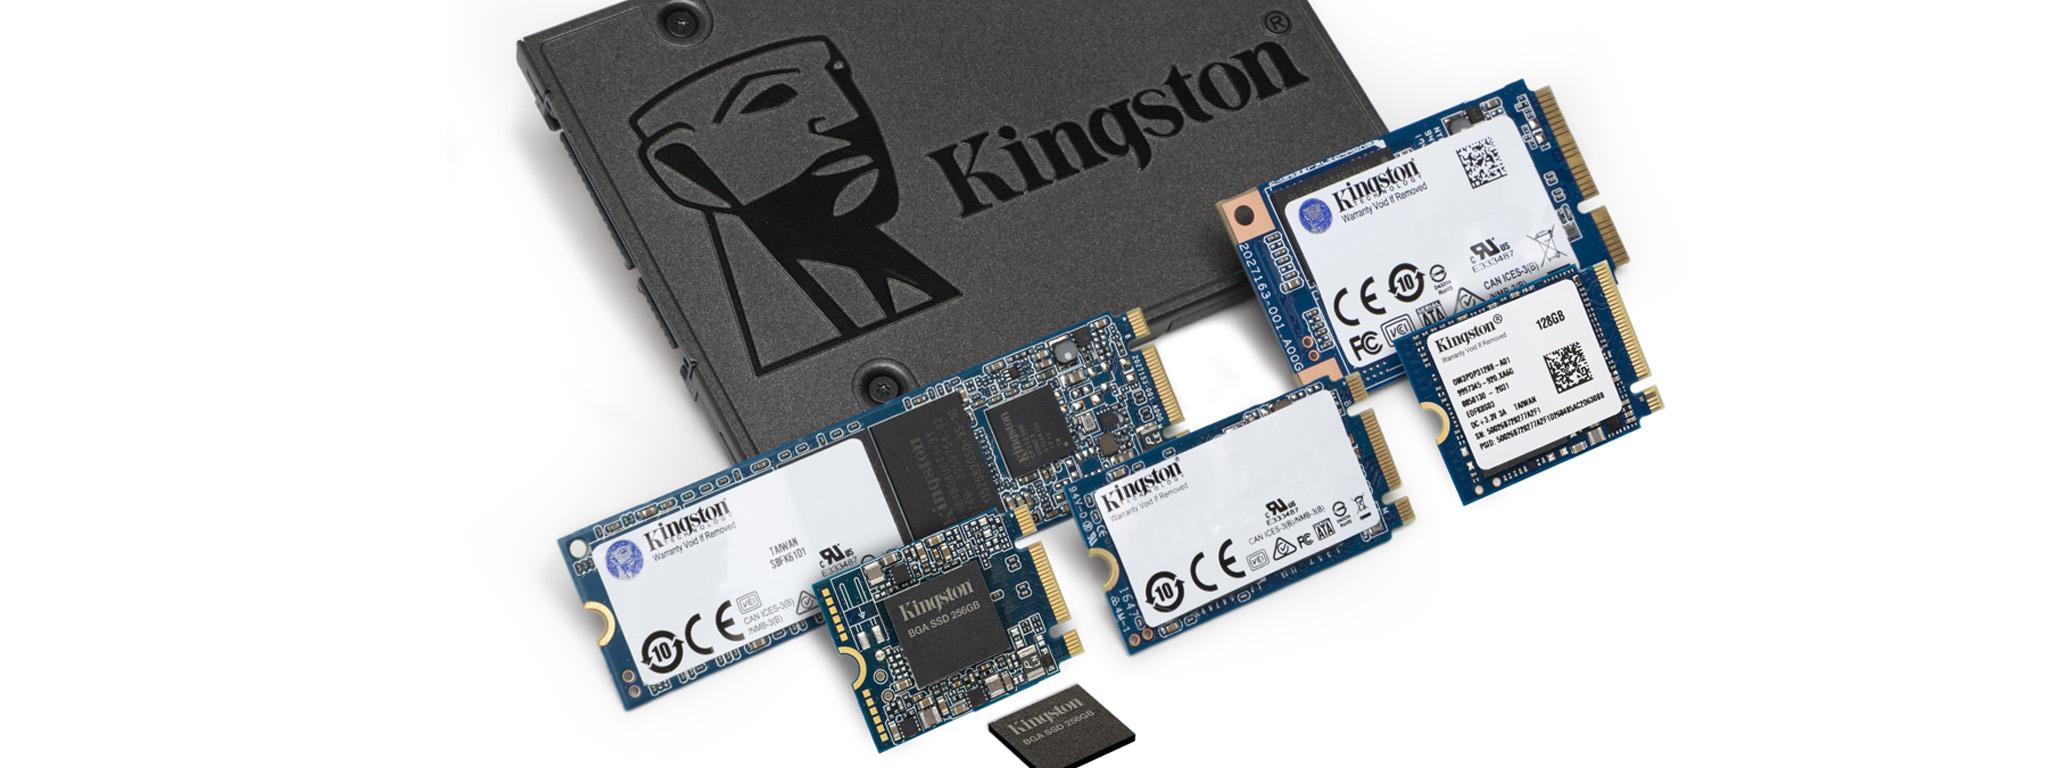 SATA SSD หนึ่งตัว M.2 SSD ขนาด 2230, 2280 และ 2242 หนึ่งตัว mSATA SSD สองตัวและ SSD แพคเกจแบบ BGA หนึ่งชุด